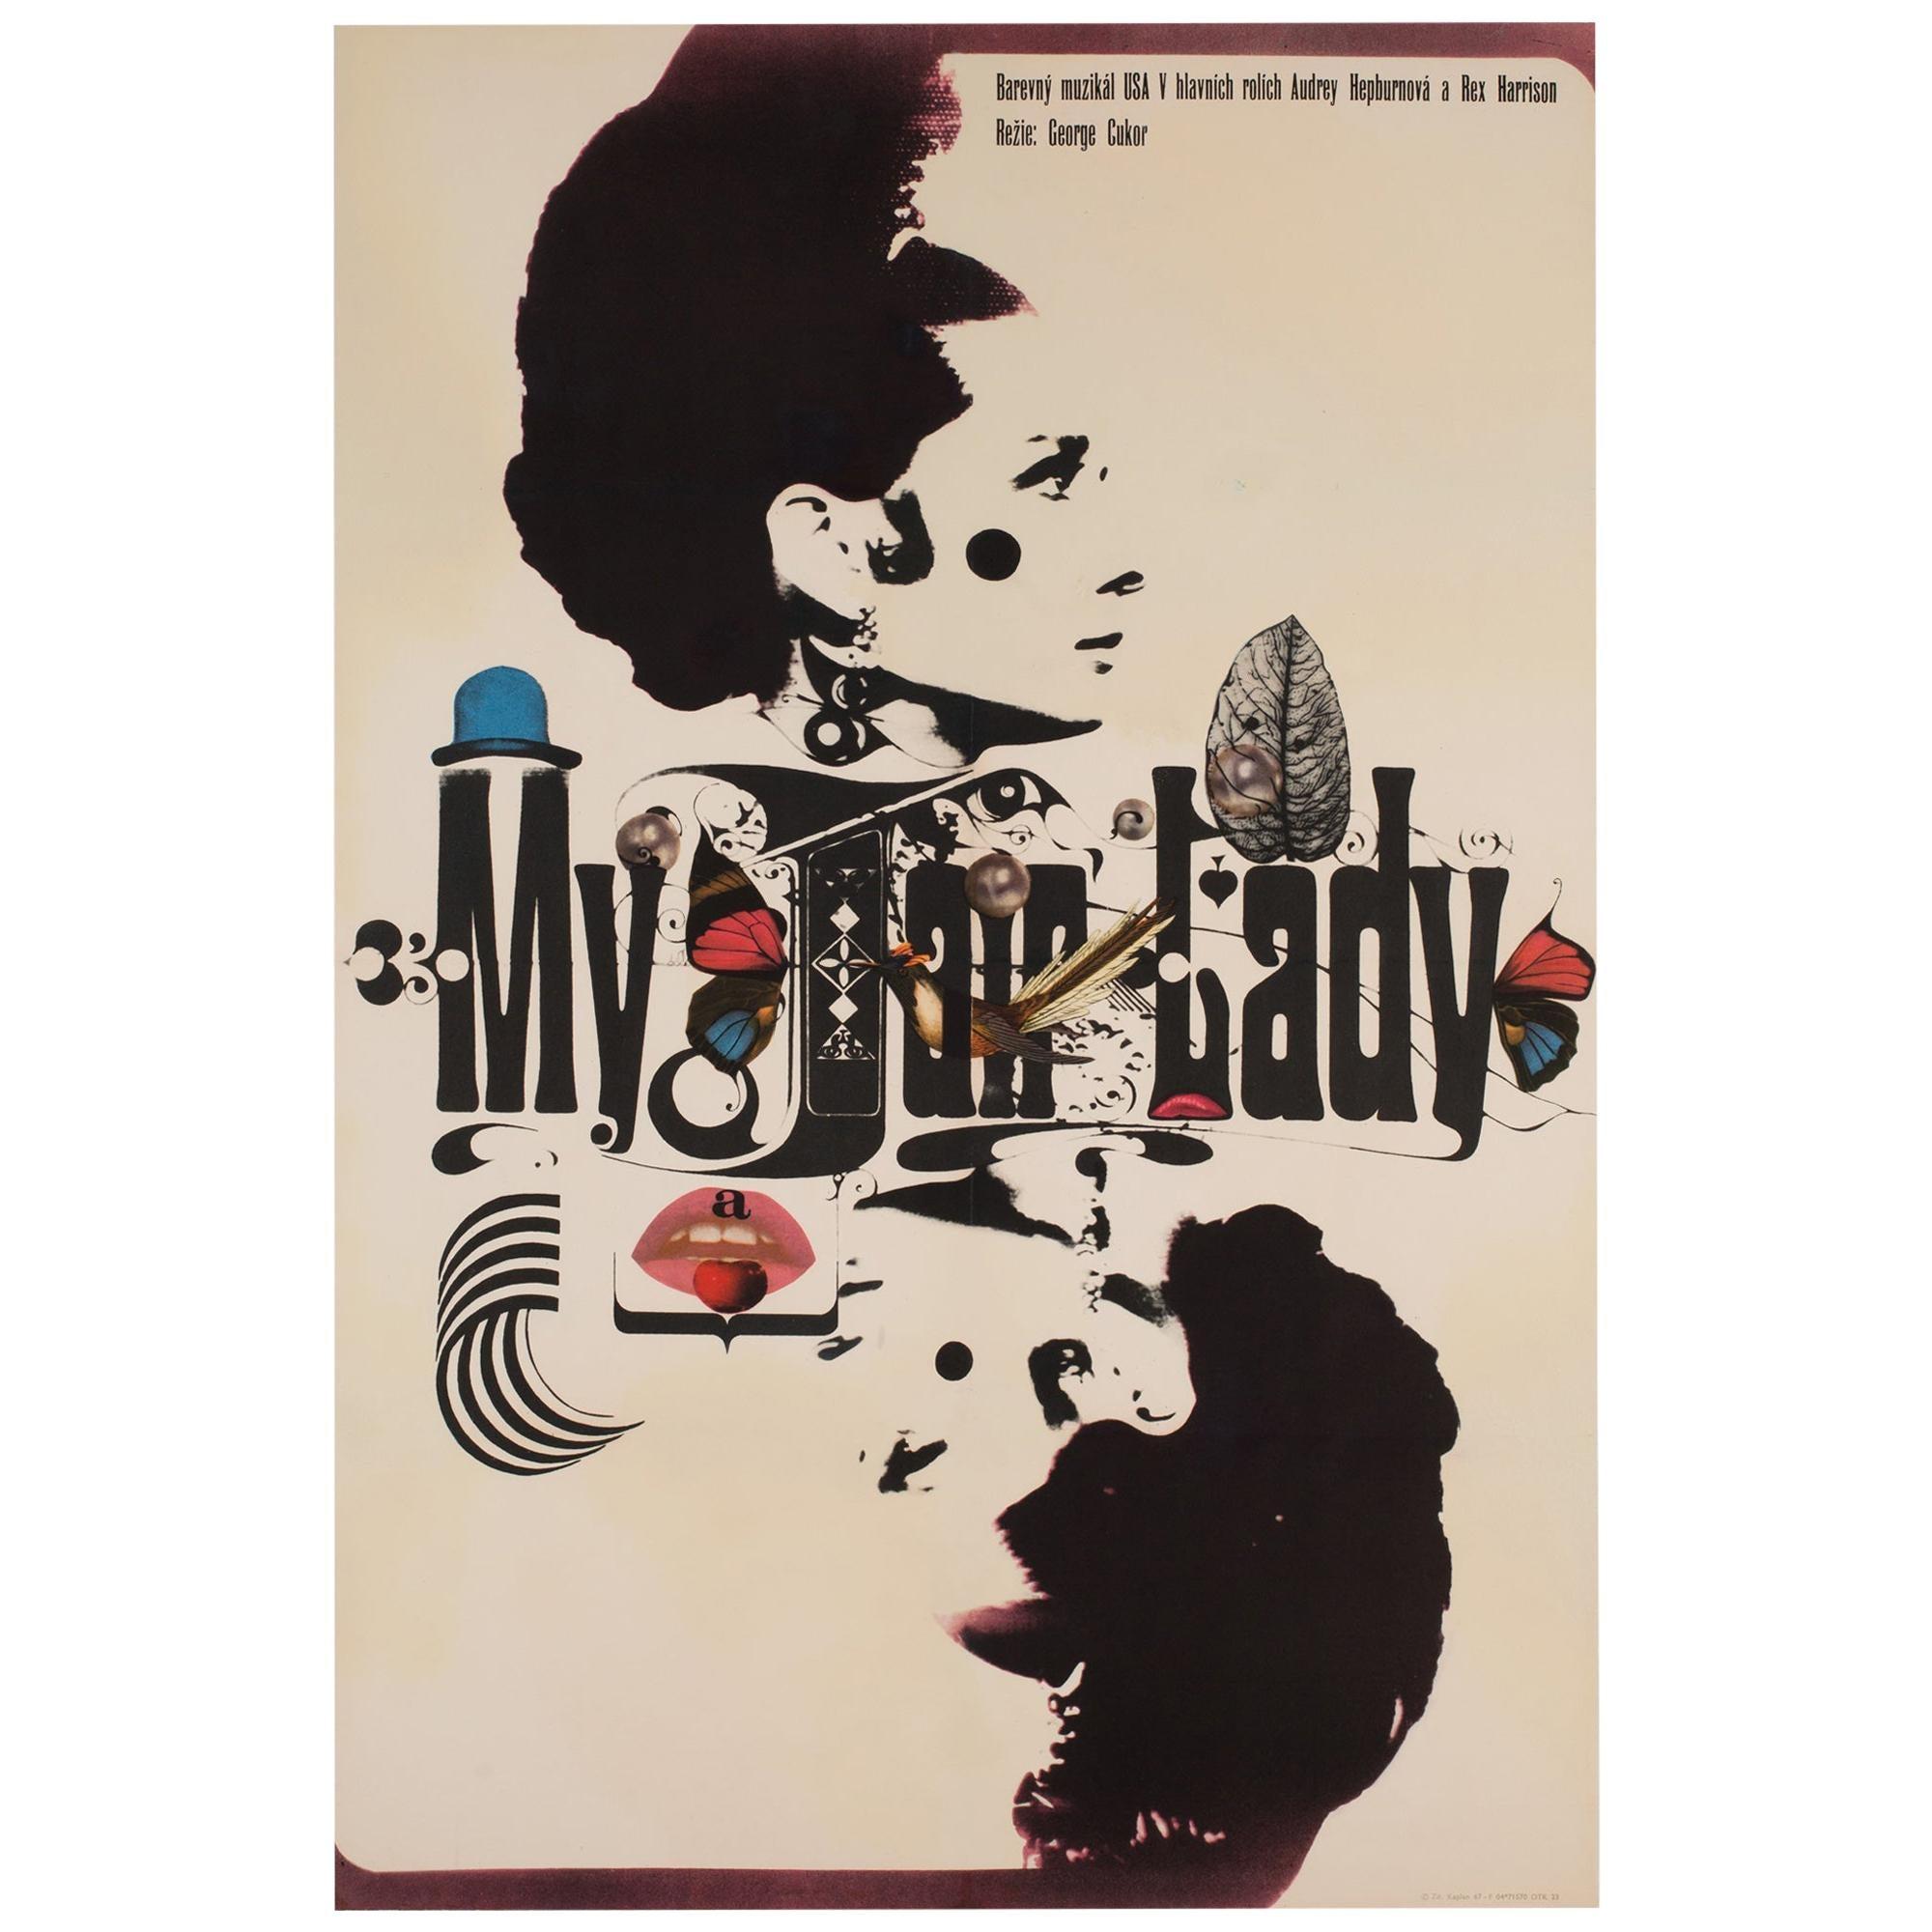 My Fair Lady Czech A1 Film Movie Poster, 1967, Zdeněk Kaplan